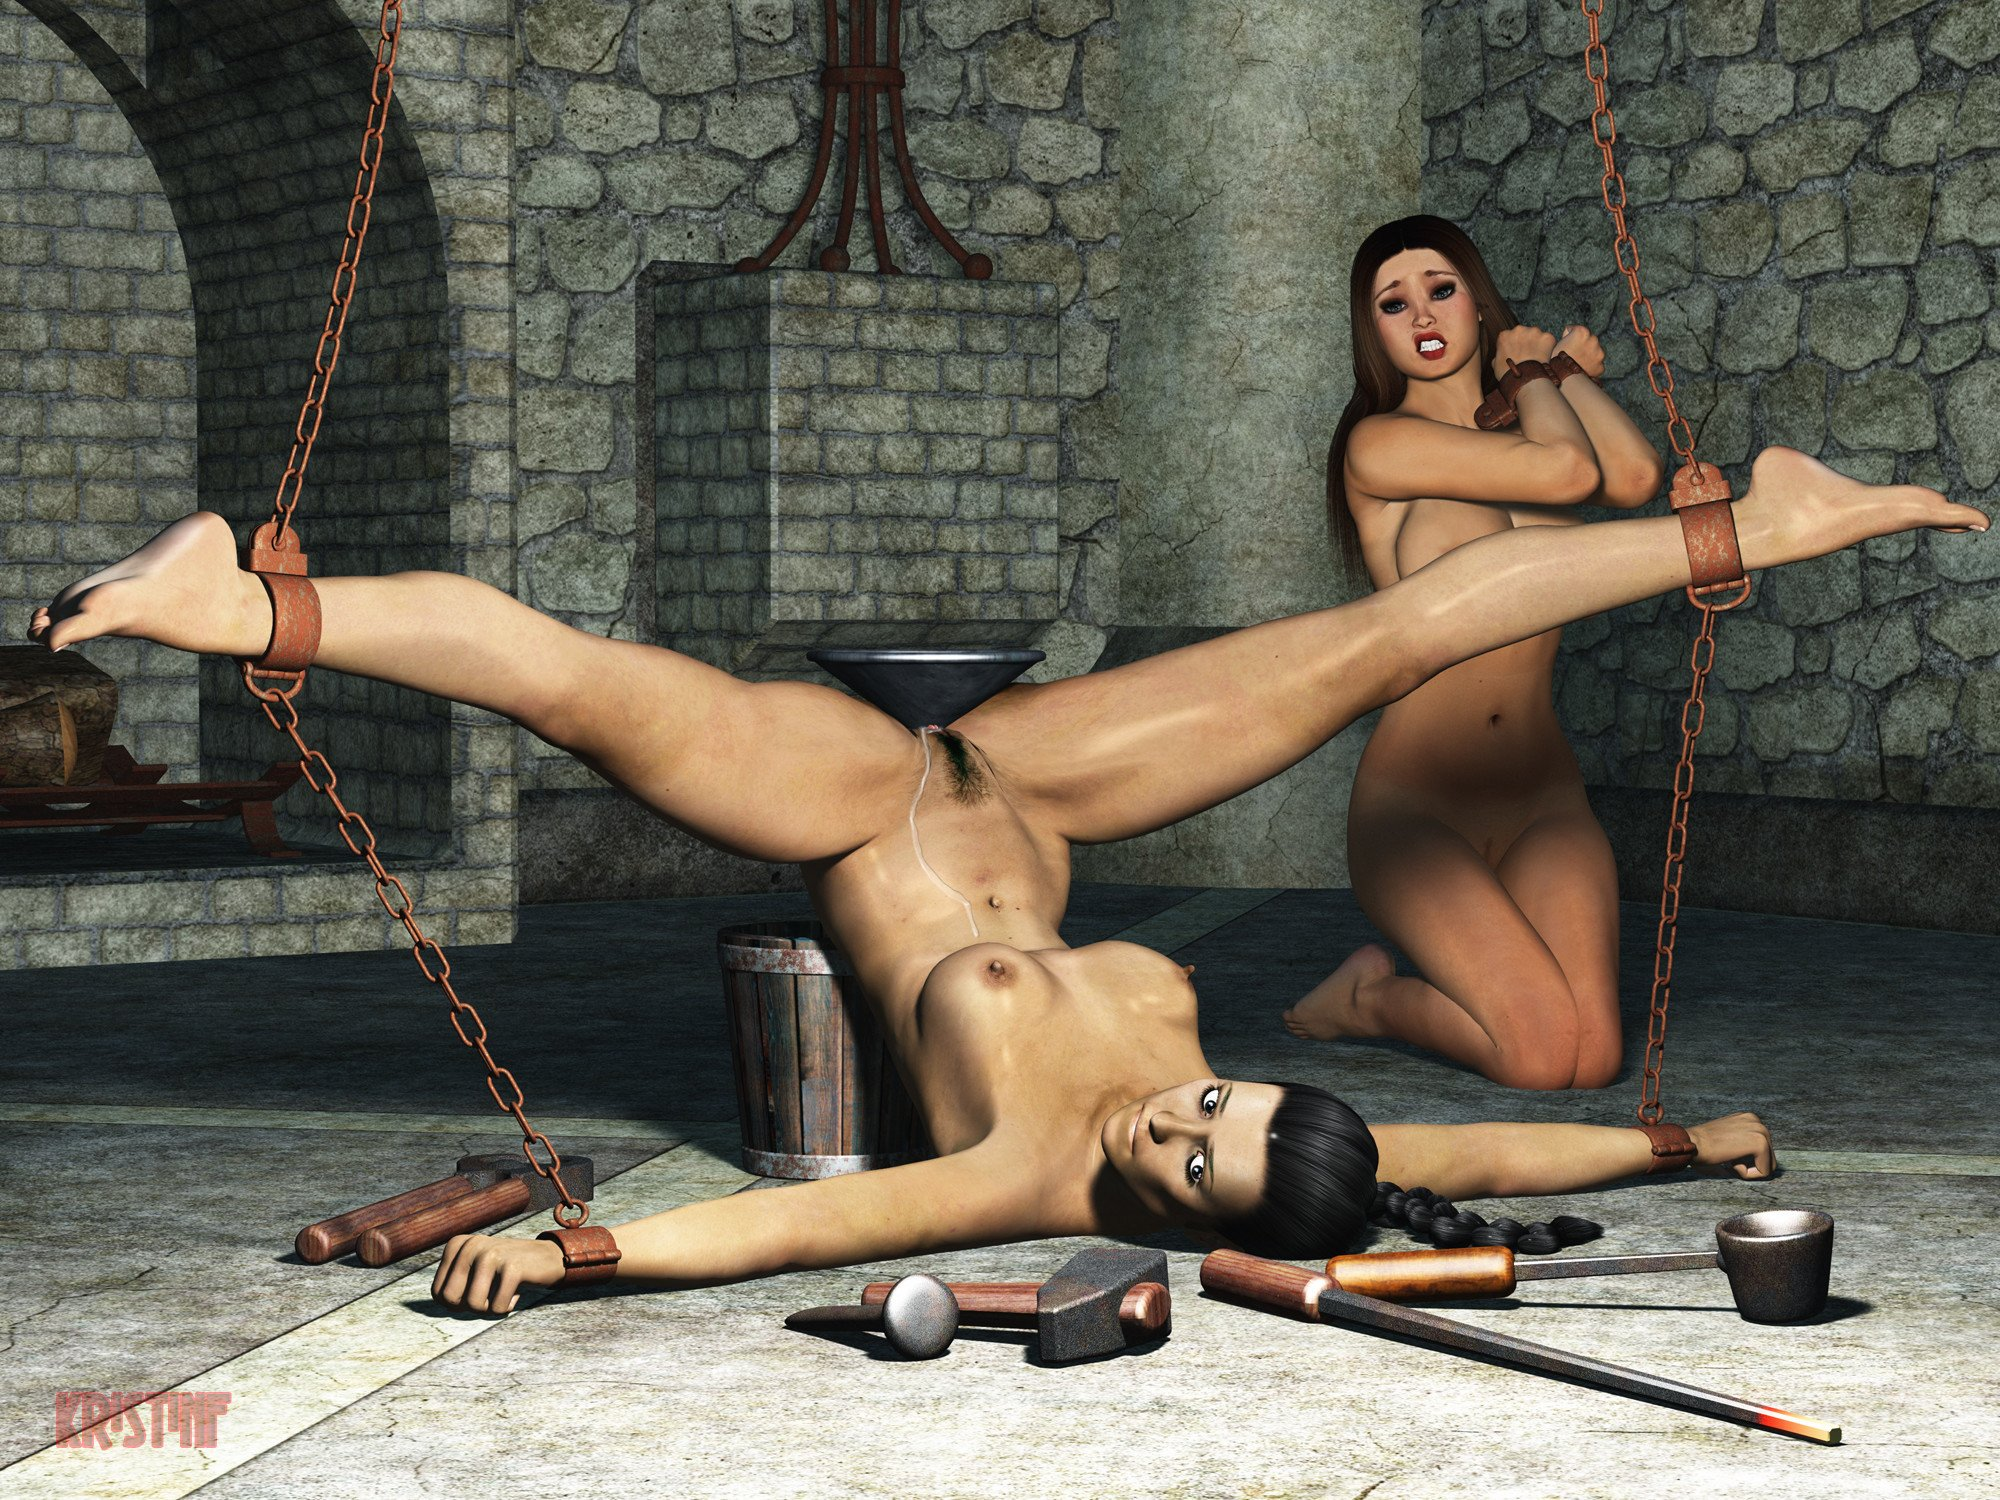 Torture naked girls naked galery